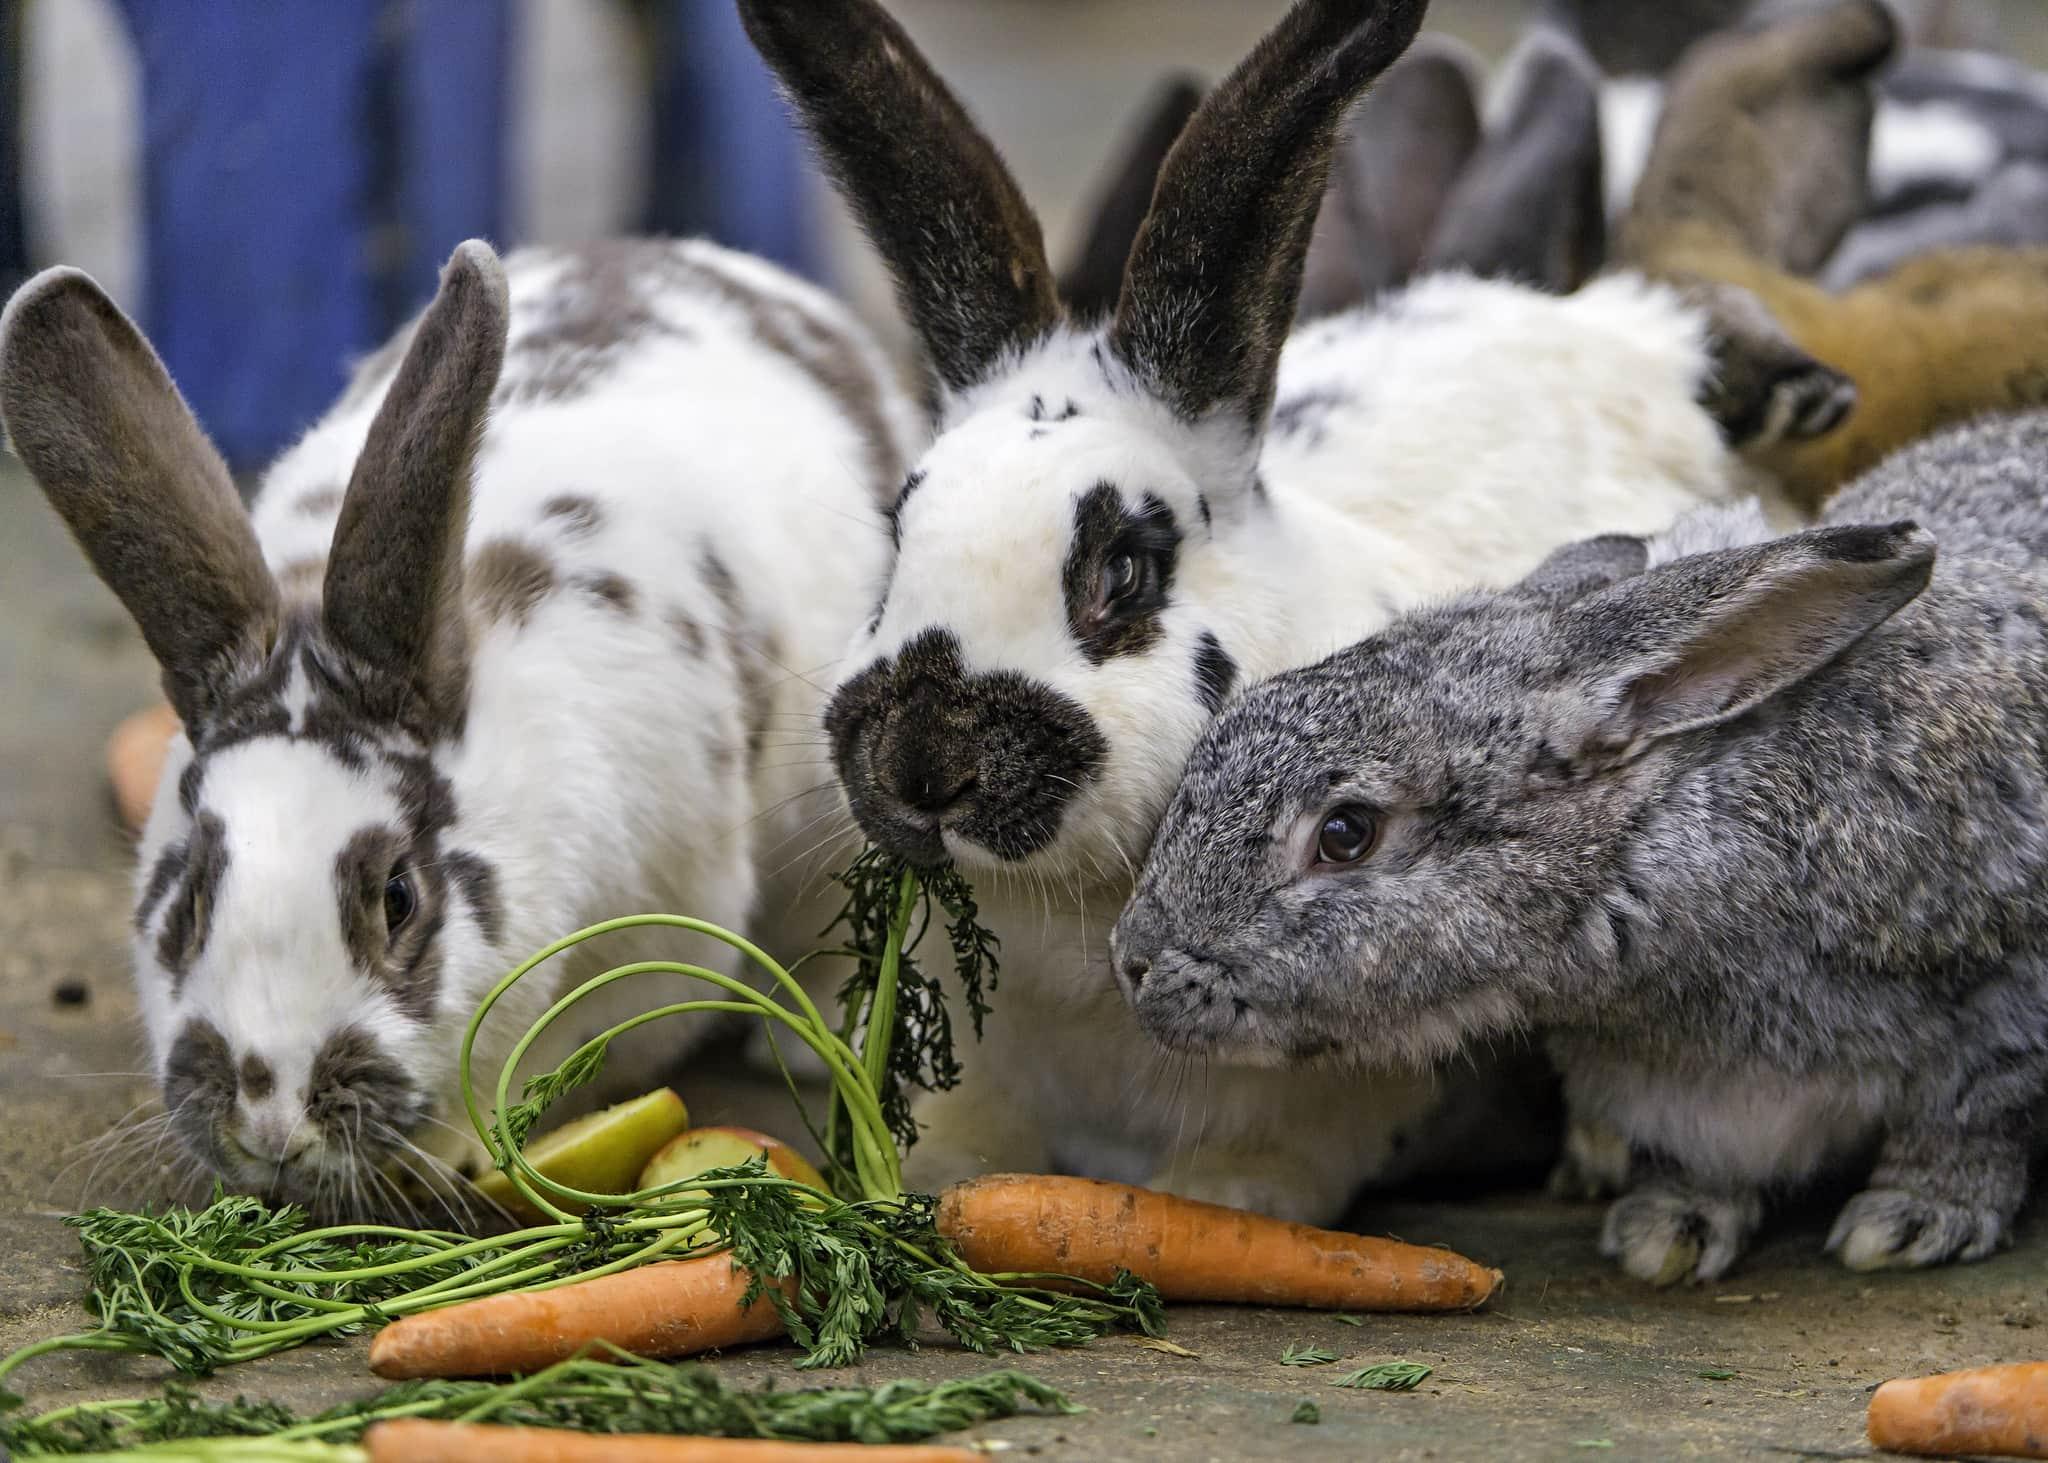 rabbits eating carrots